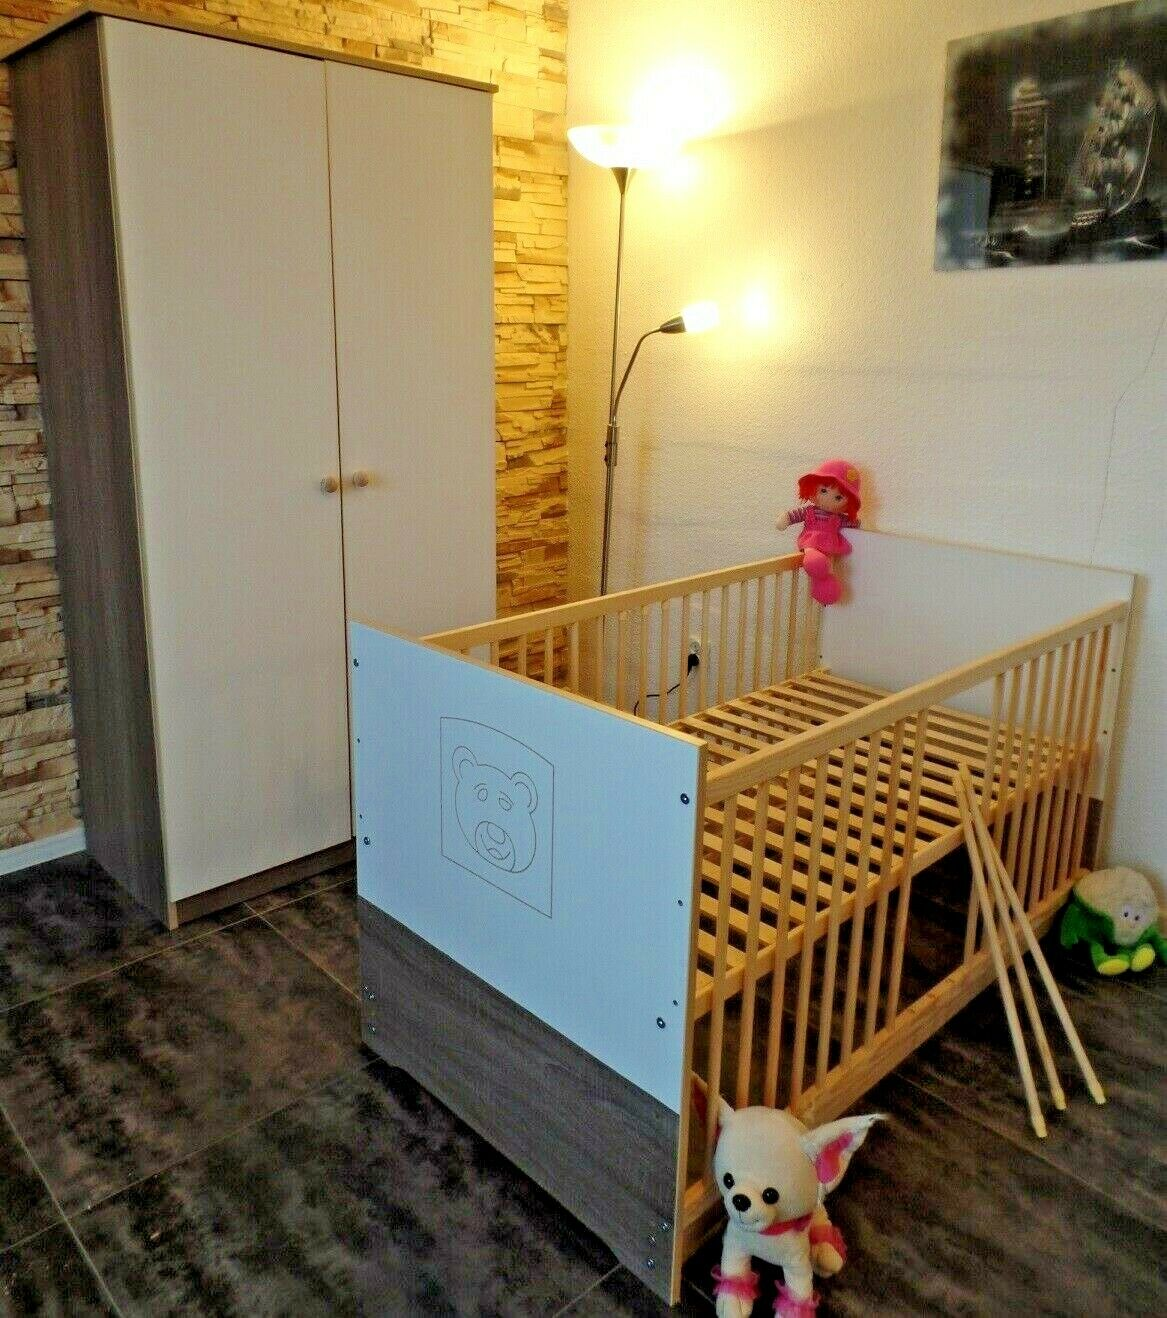 Babyzimmer Komplett Schrank Babybett Umbaubar Jugendbett 140x70 Weiß-Braun